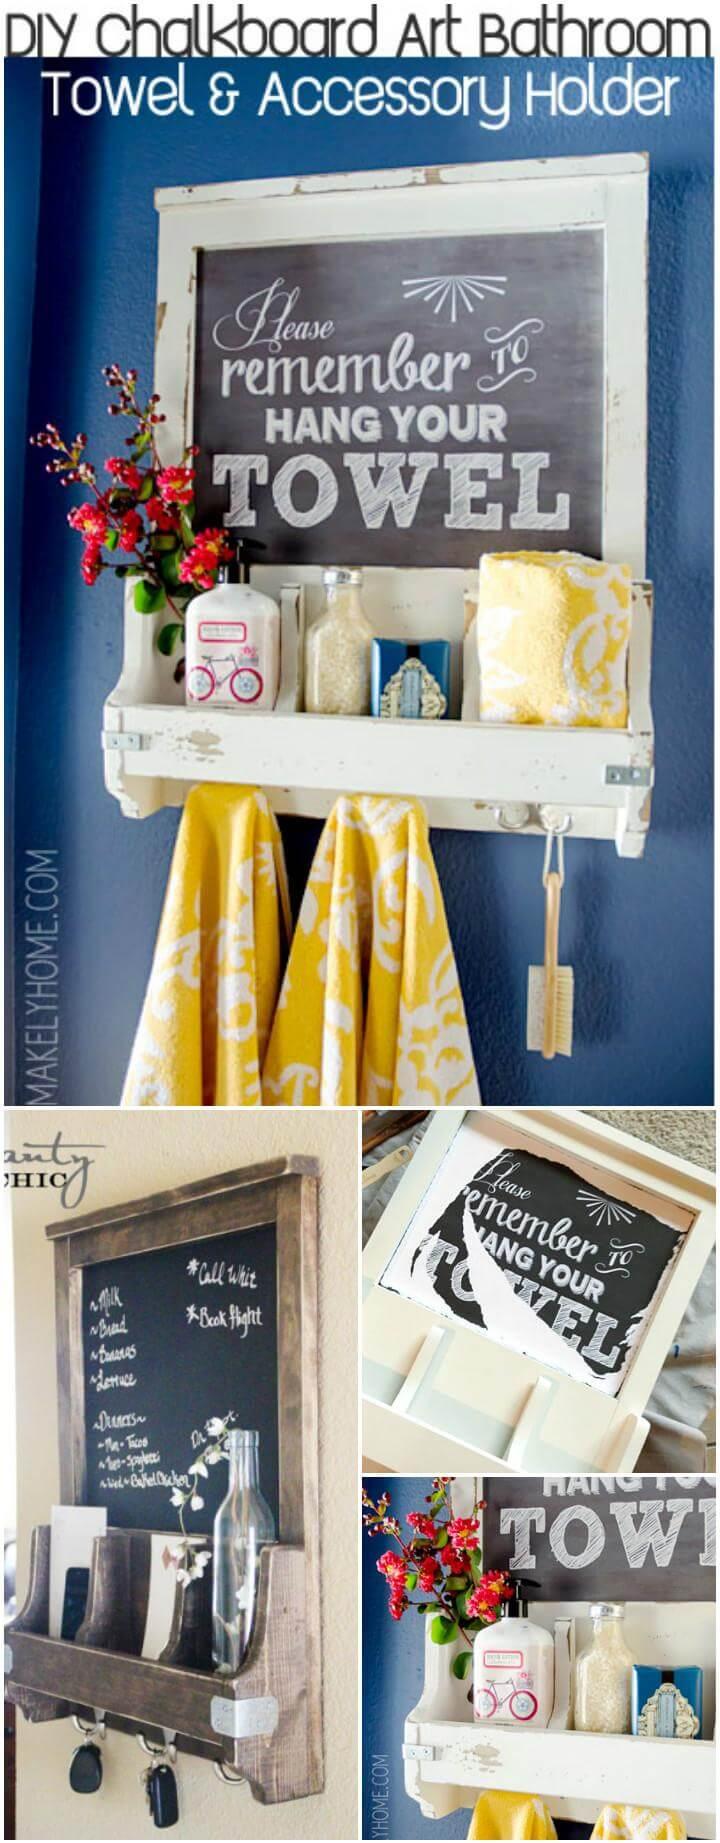 handmade chalkboard art towel rack and bathroom accessory organizer